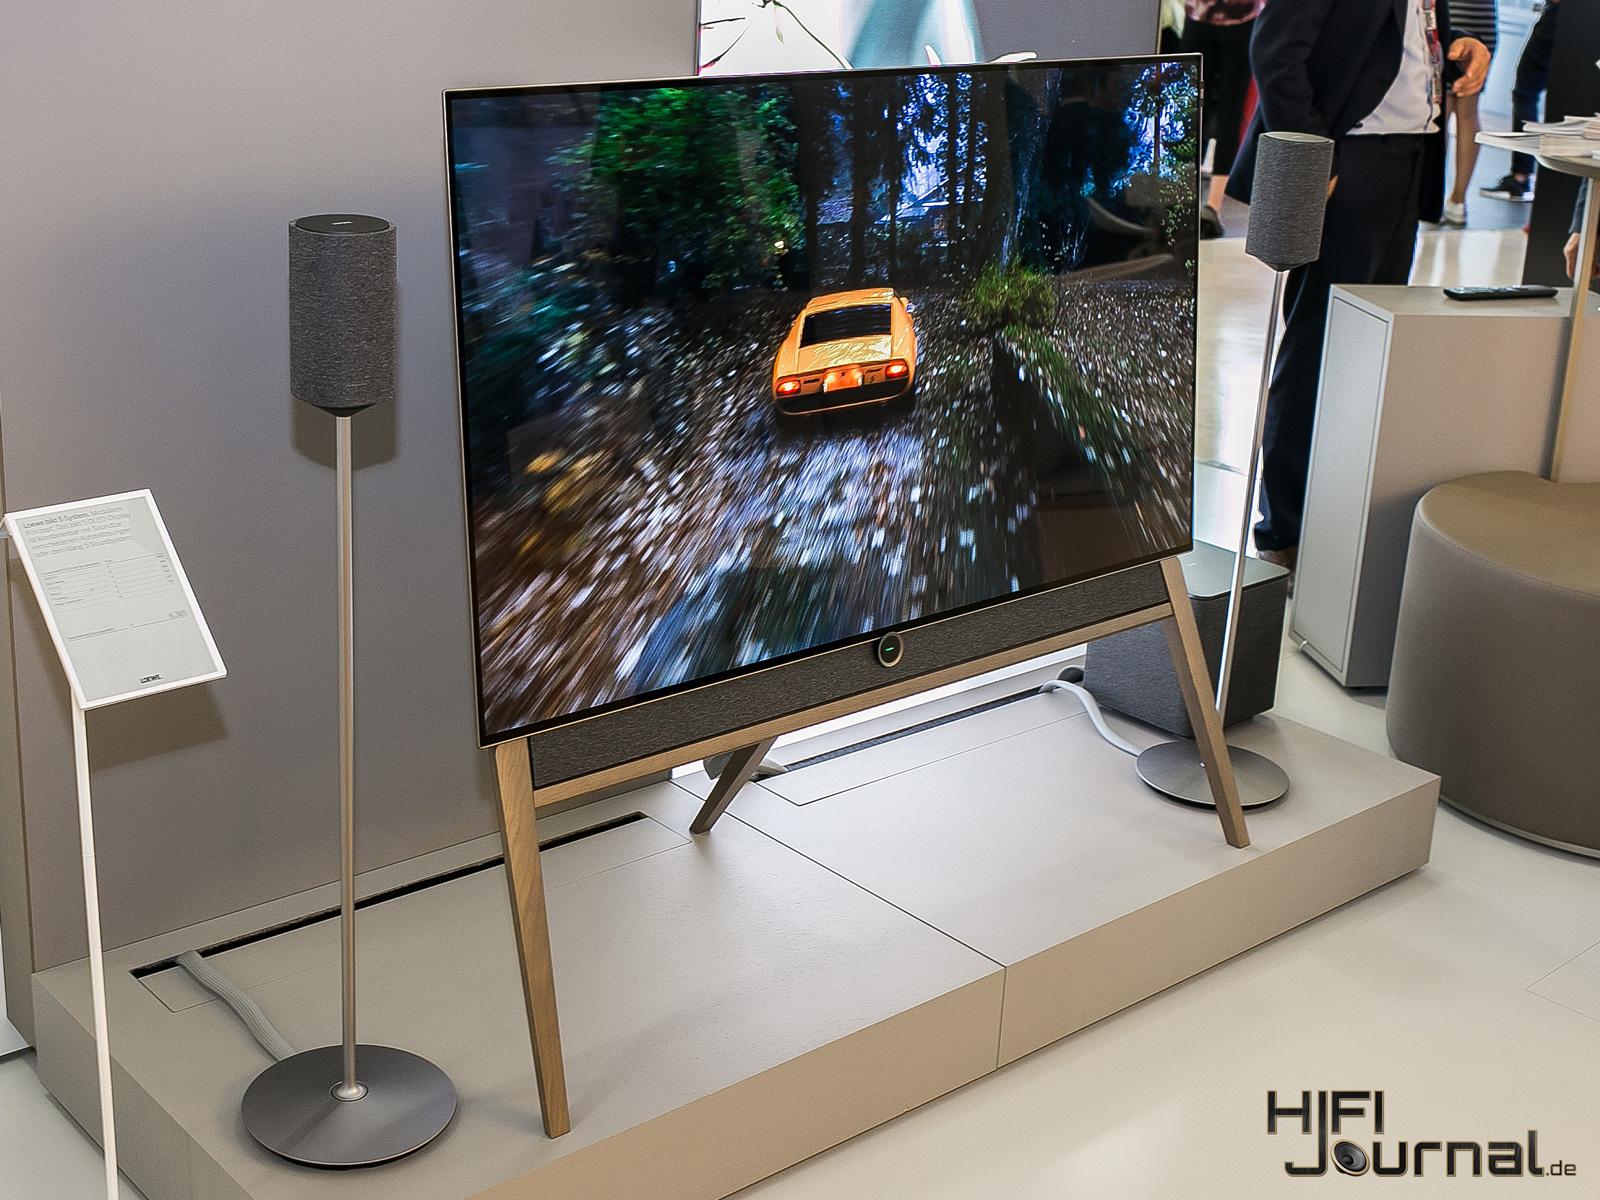 loewe bild 5 oled hands on video hifi journal. Black Bedroom Furniture Sets. Home Design Ideas